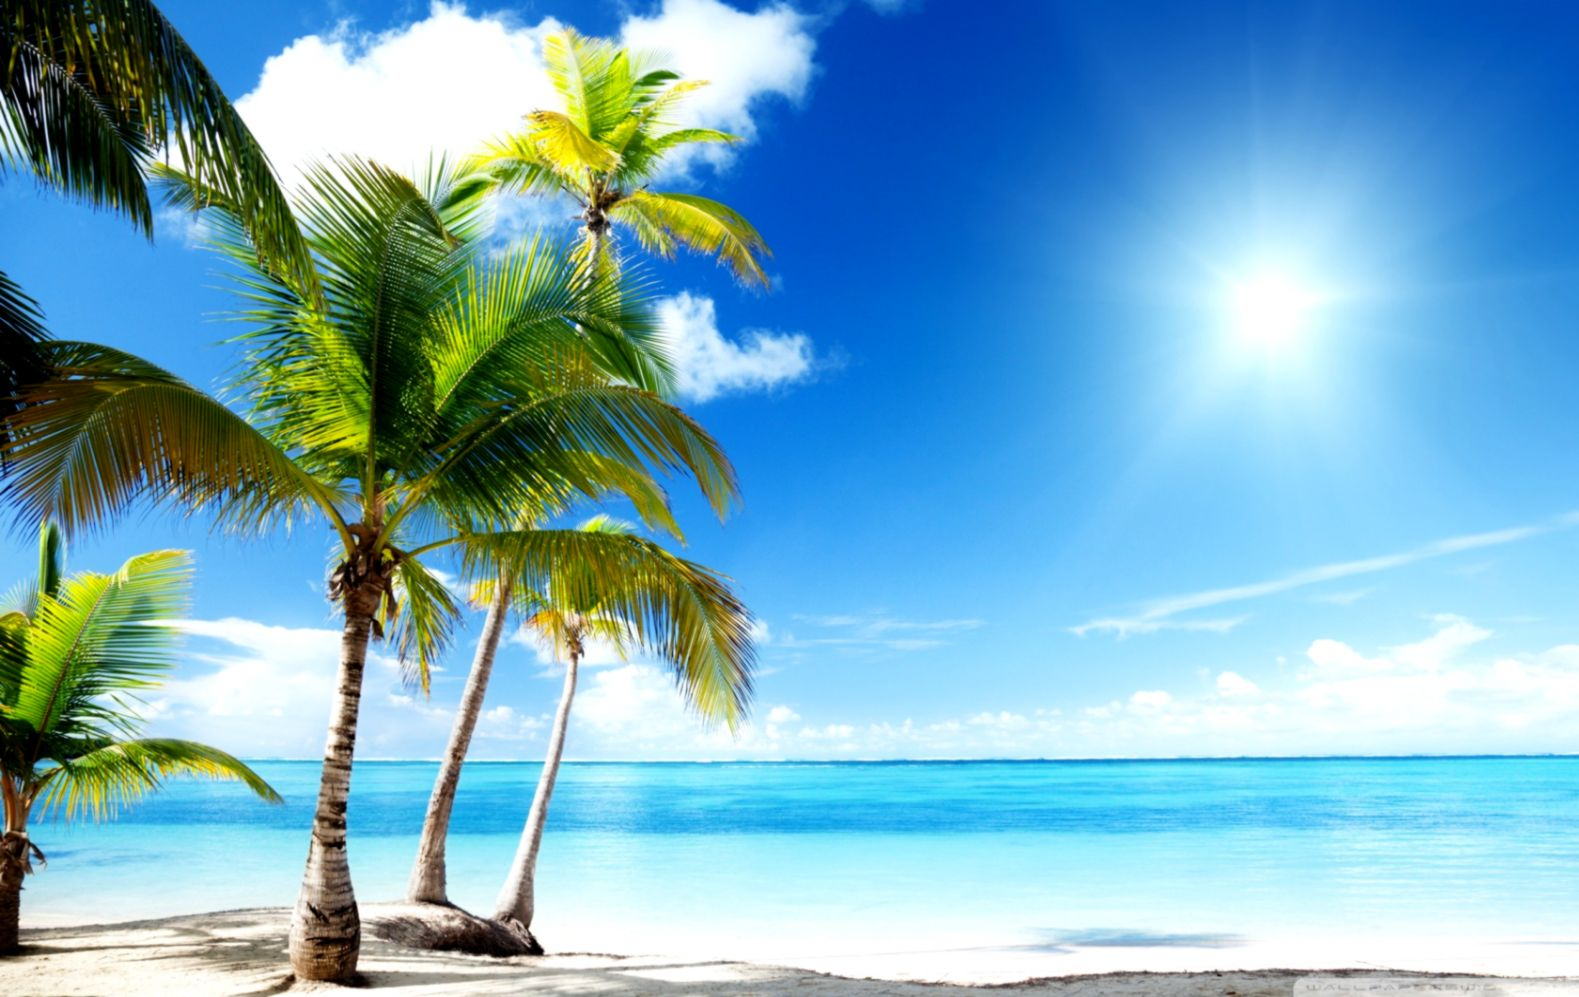 Tropical Beach Paradise ❤ 4k Hd Desktop Wallpaper For - Tropical Beach Paradise , HD Wallpaper & Backgrounds